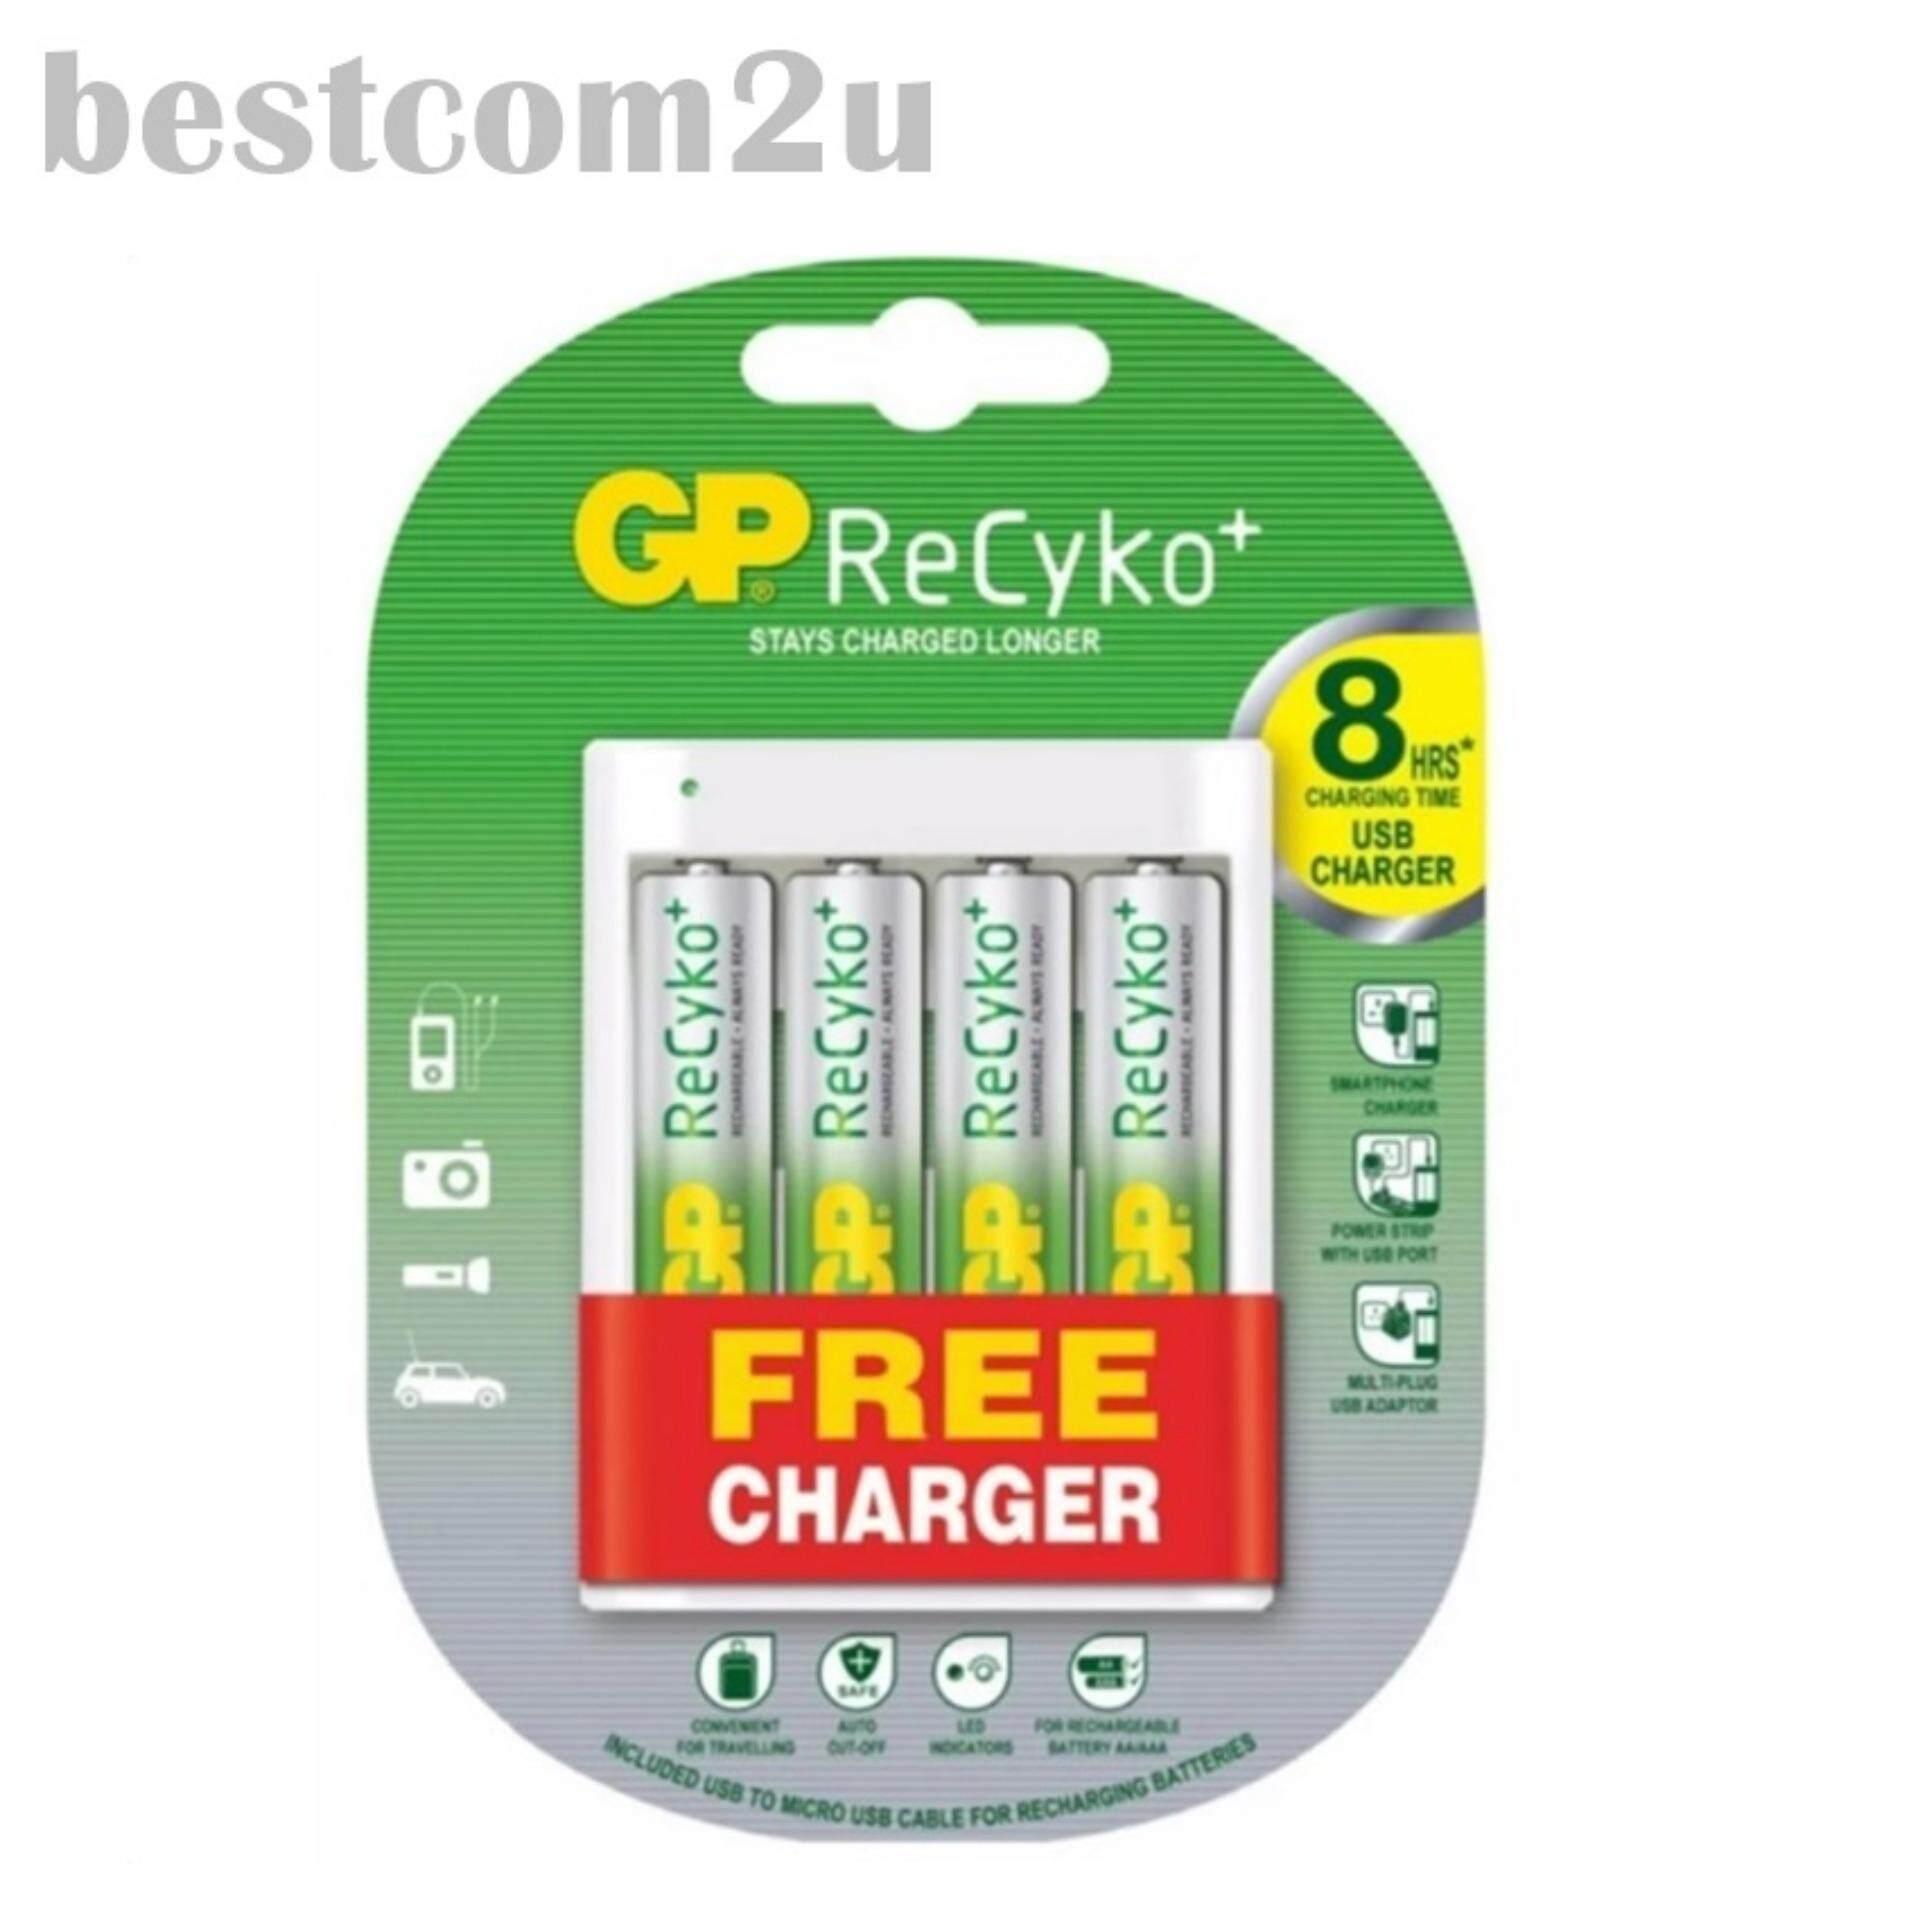 [FREE U411 Charger] GP ReCyko Rechargeable Battery 4Pcs AA 2000mAh